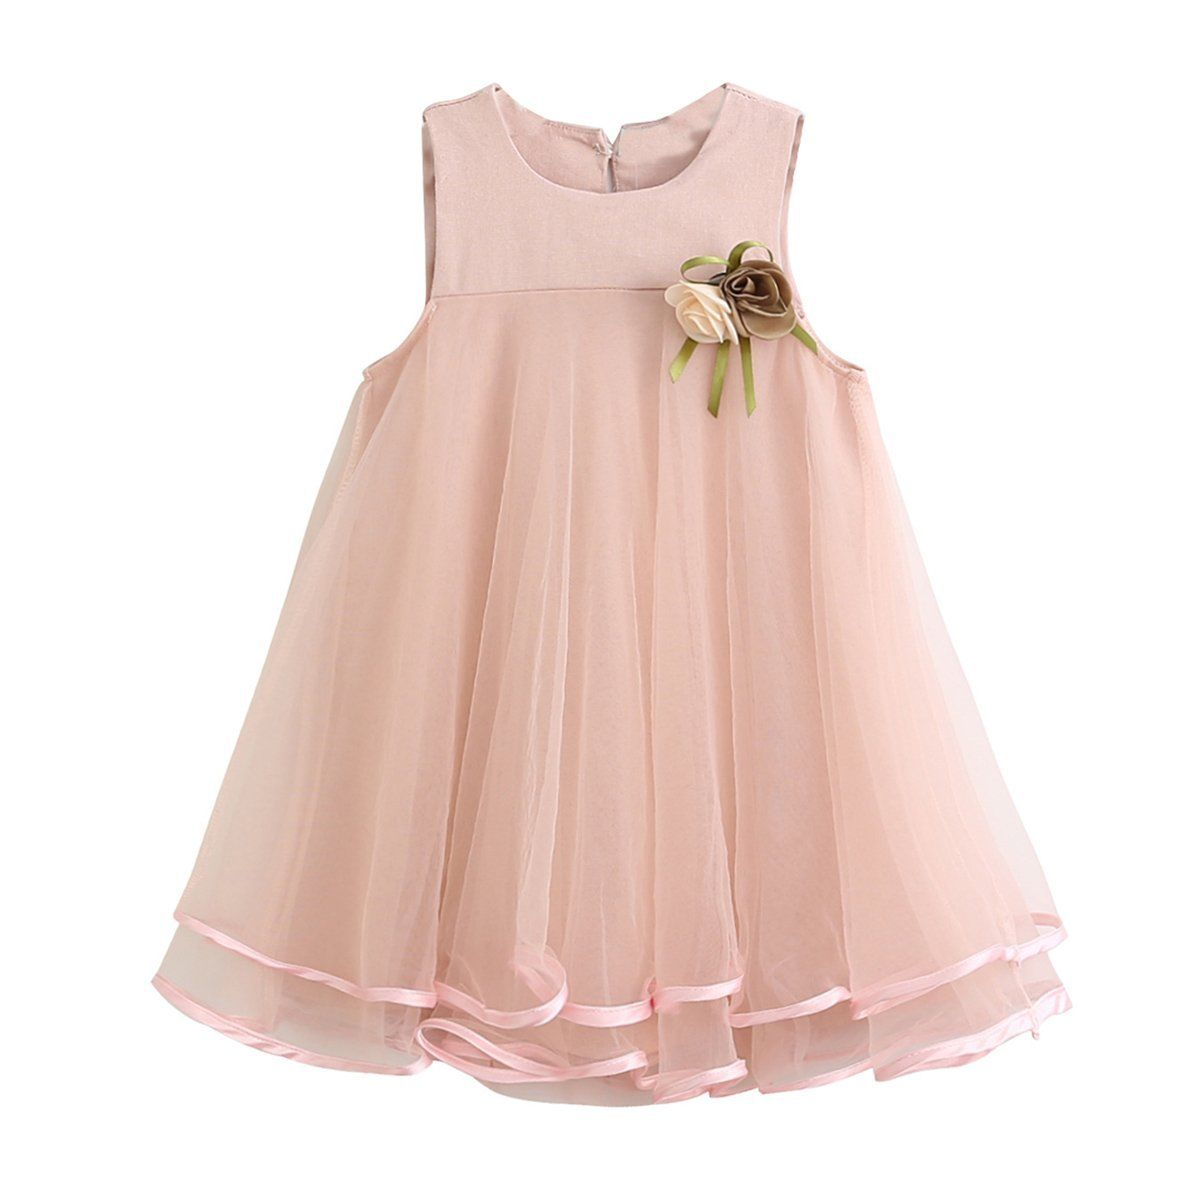 2017 flower baby girl summer princess dress kids baby for Wedding party dresses 2017